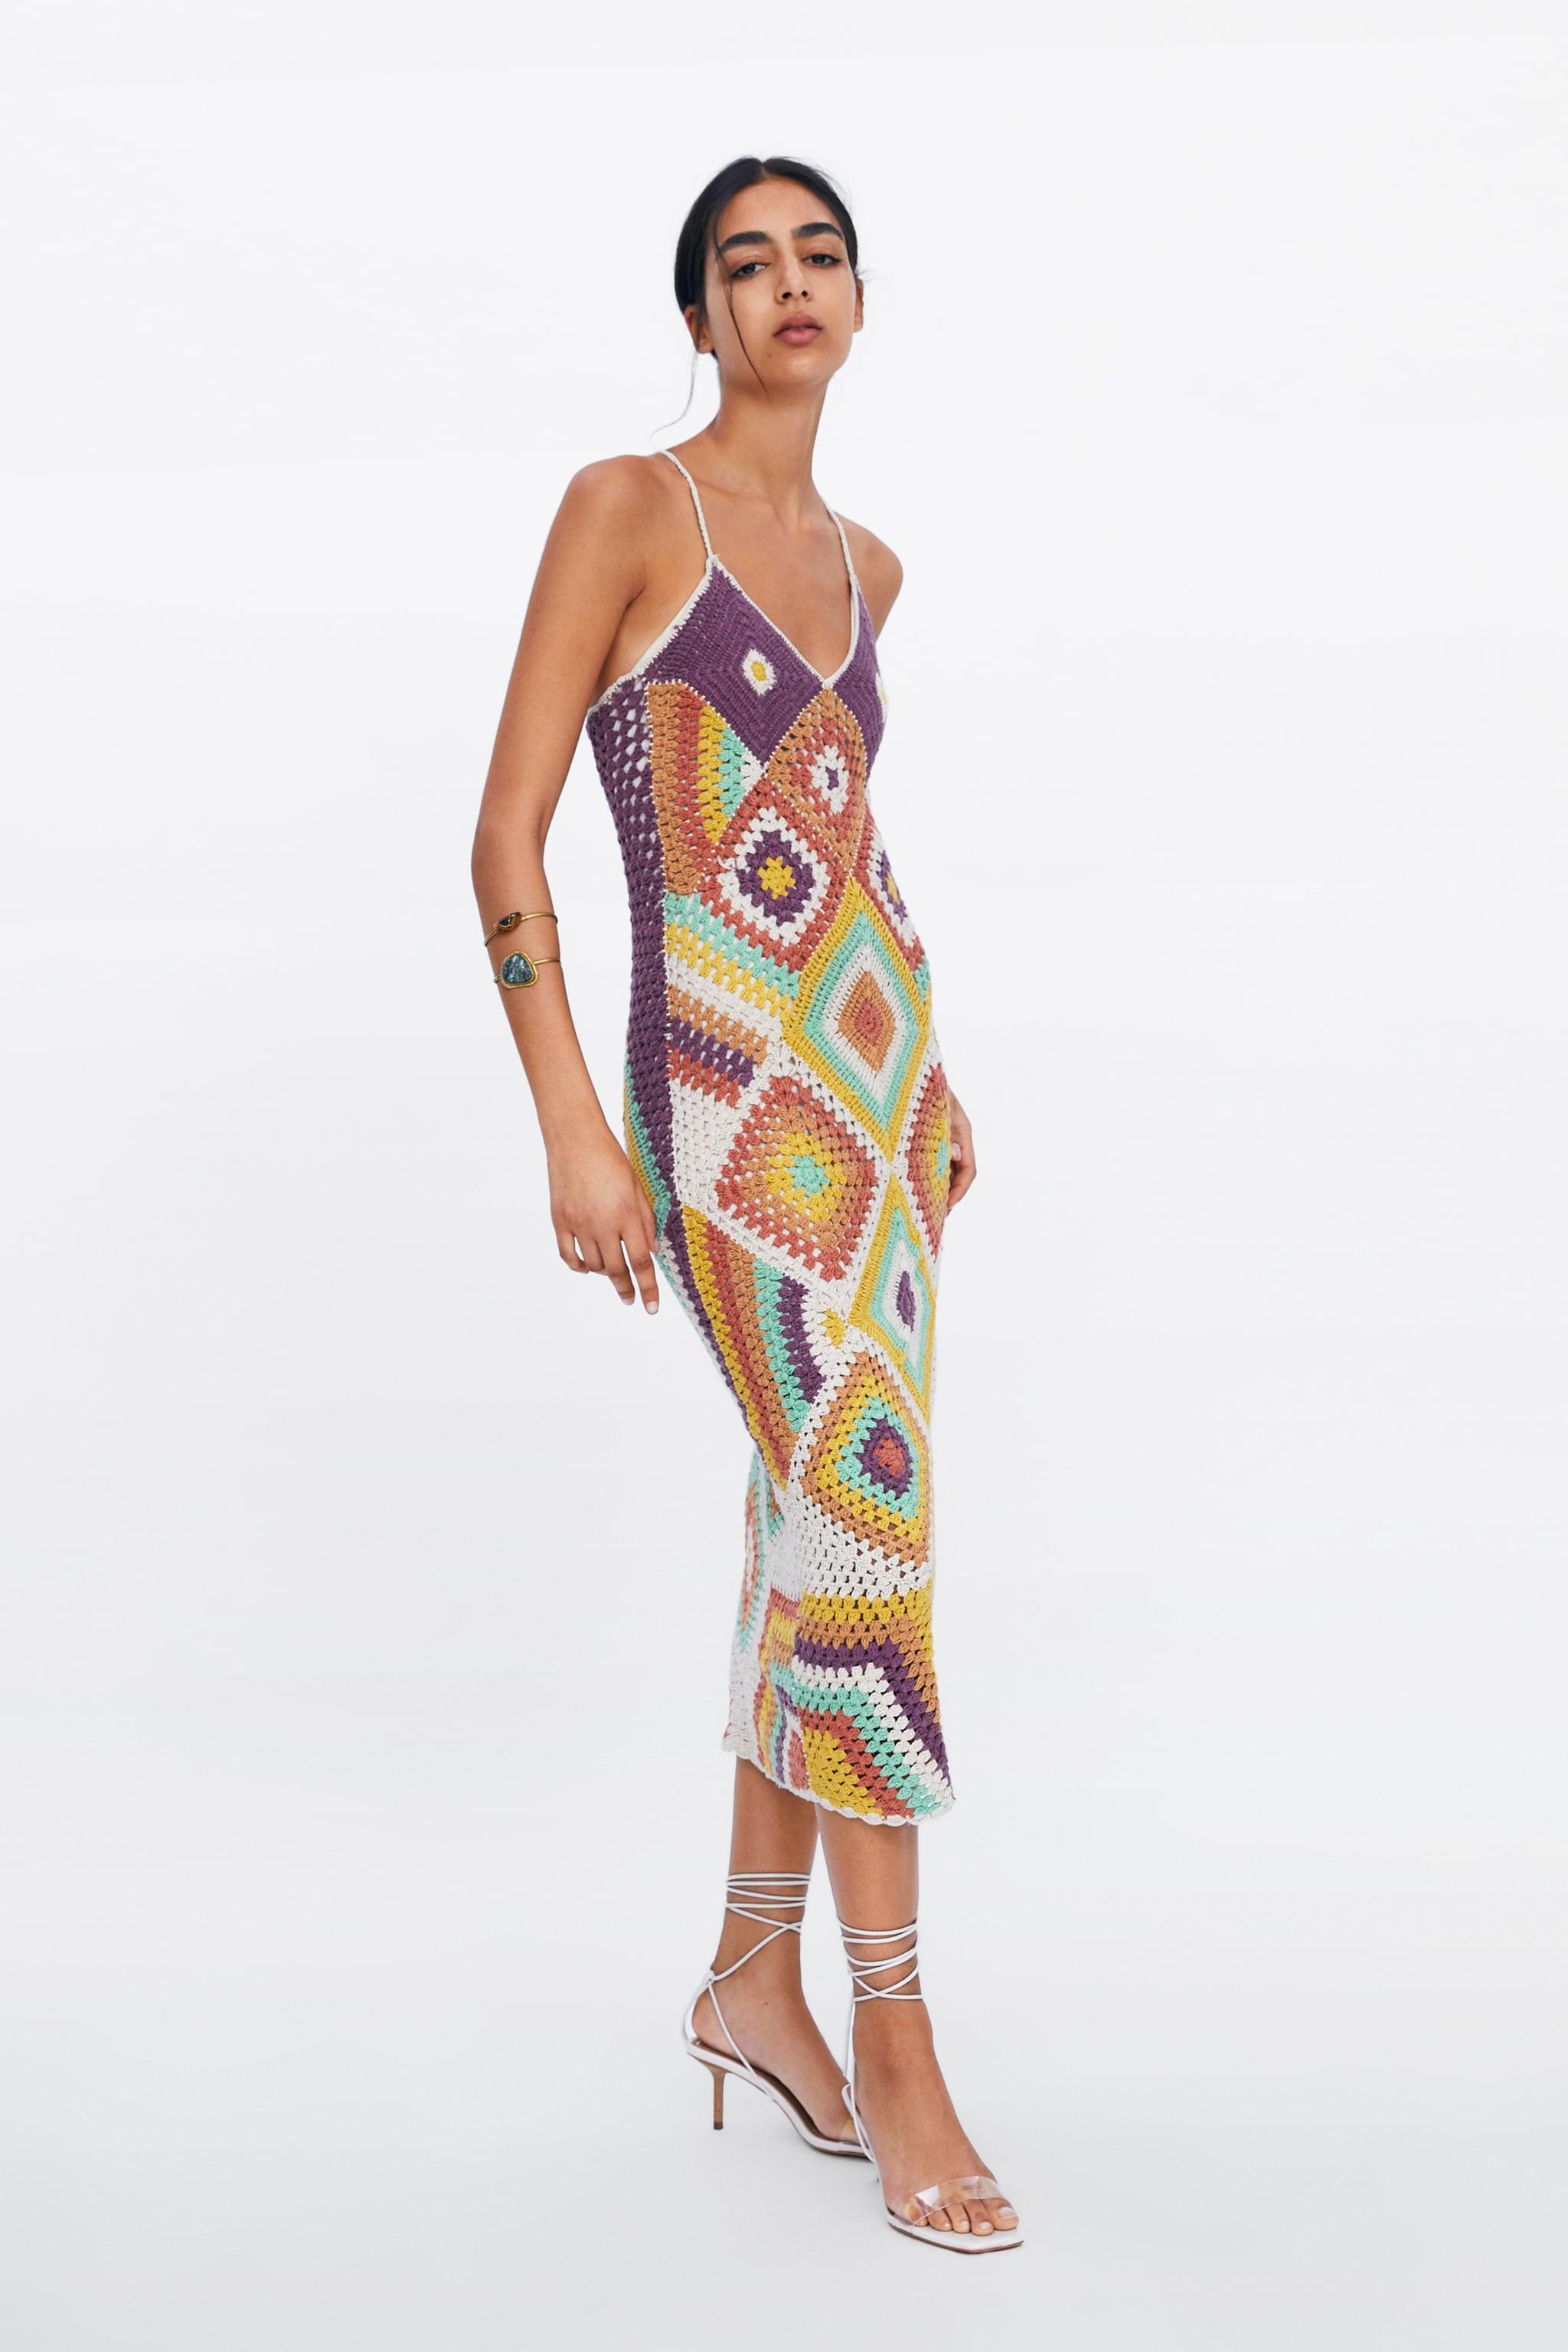 Zara COLORFUL CROCHETED DRESS